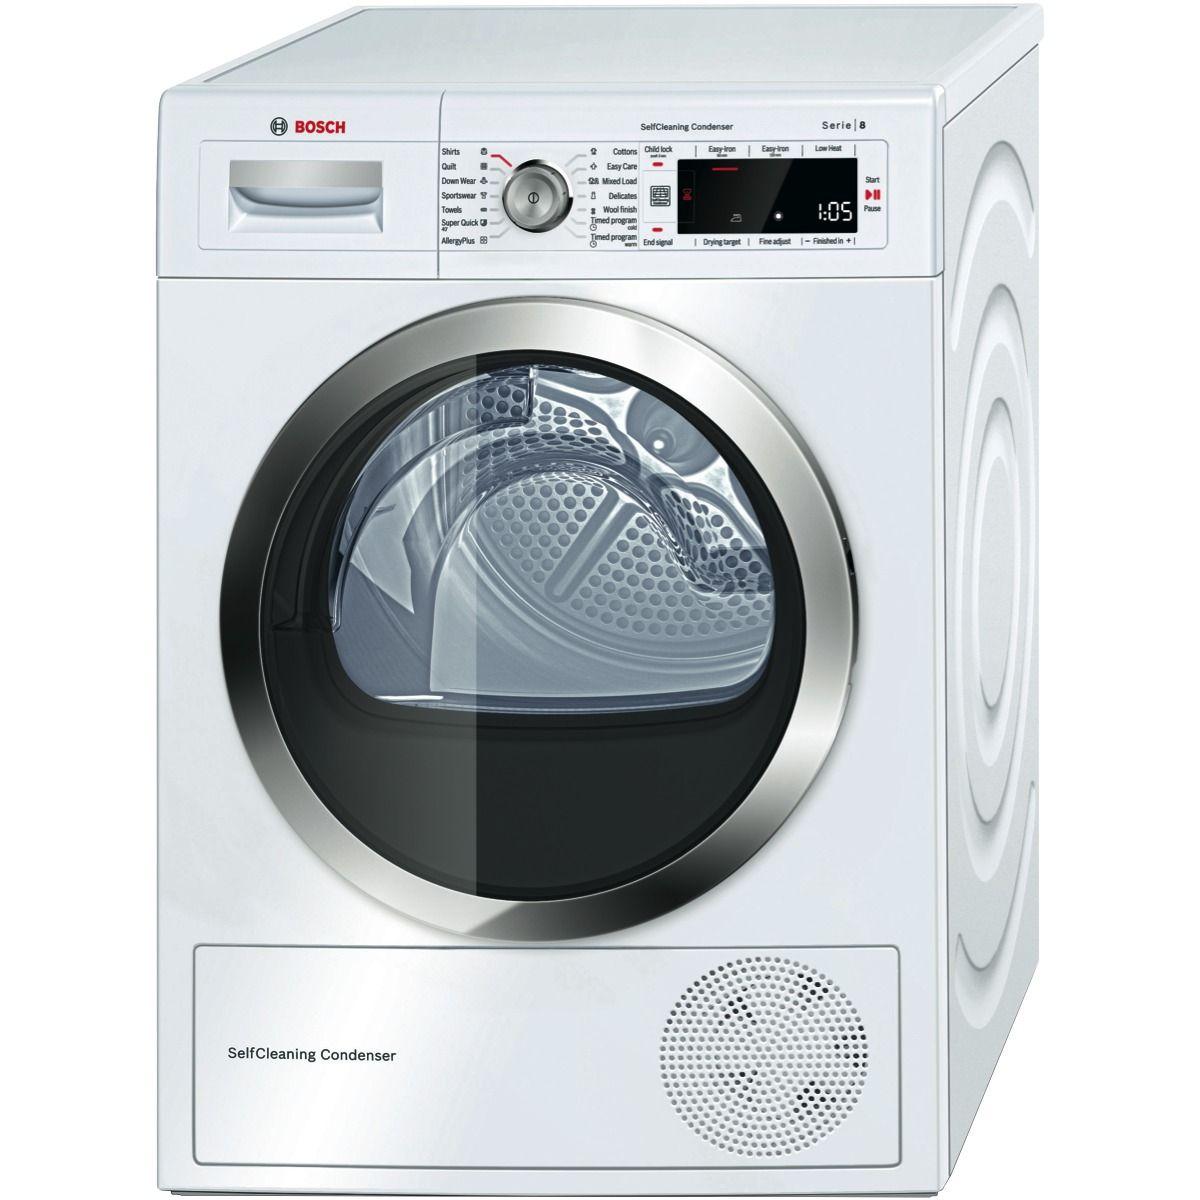 Bosch Wtw87565au 9kg Heat Pump Dryer At The Good Guys Electric